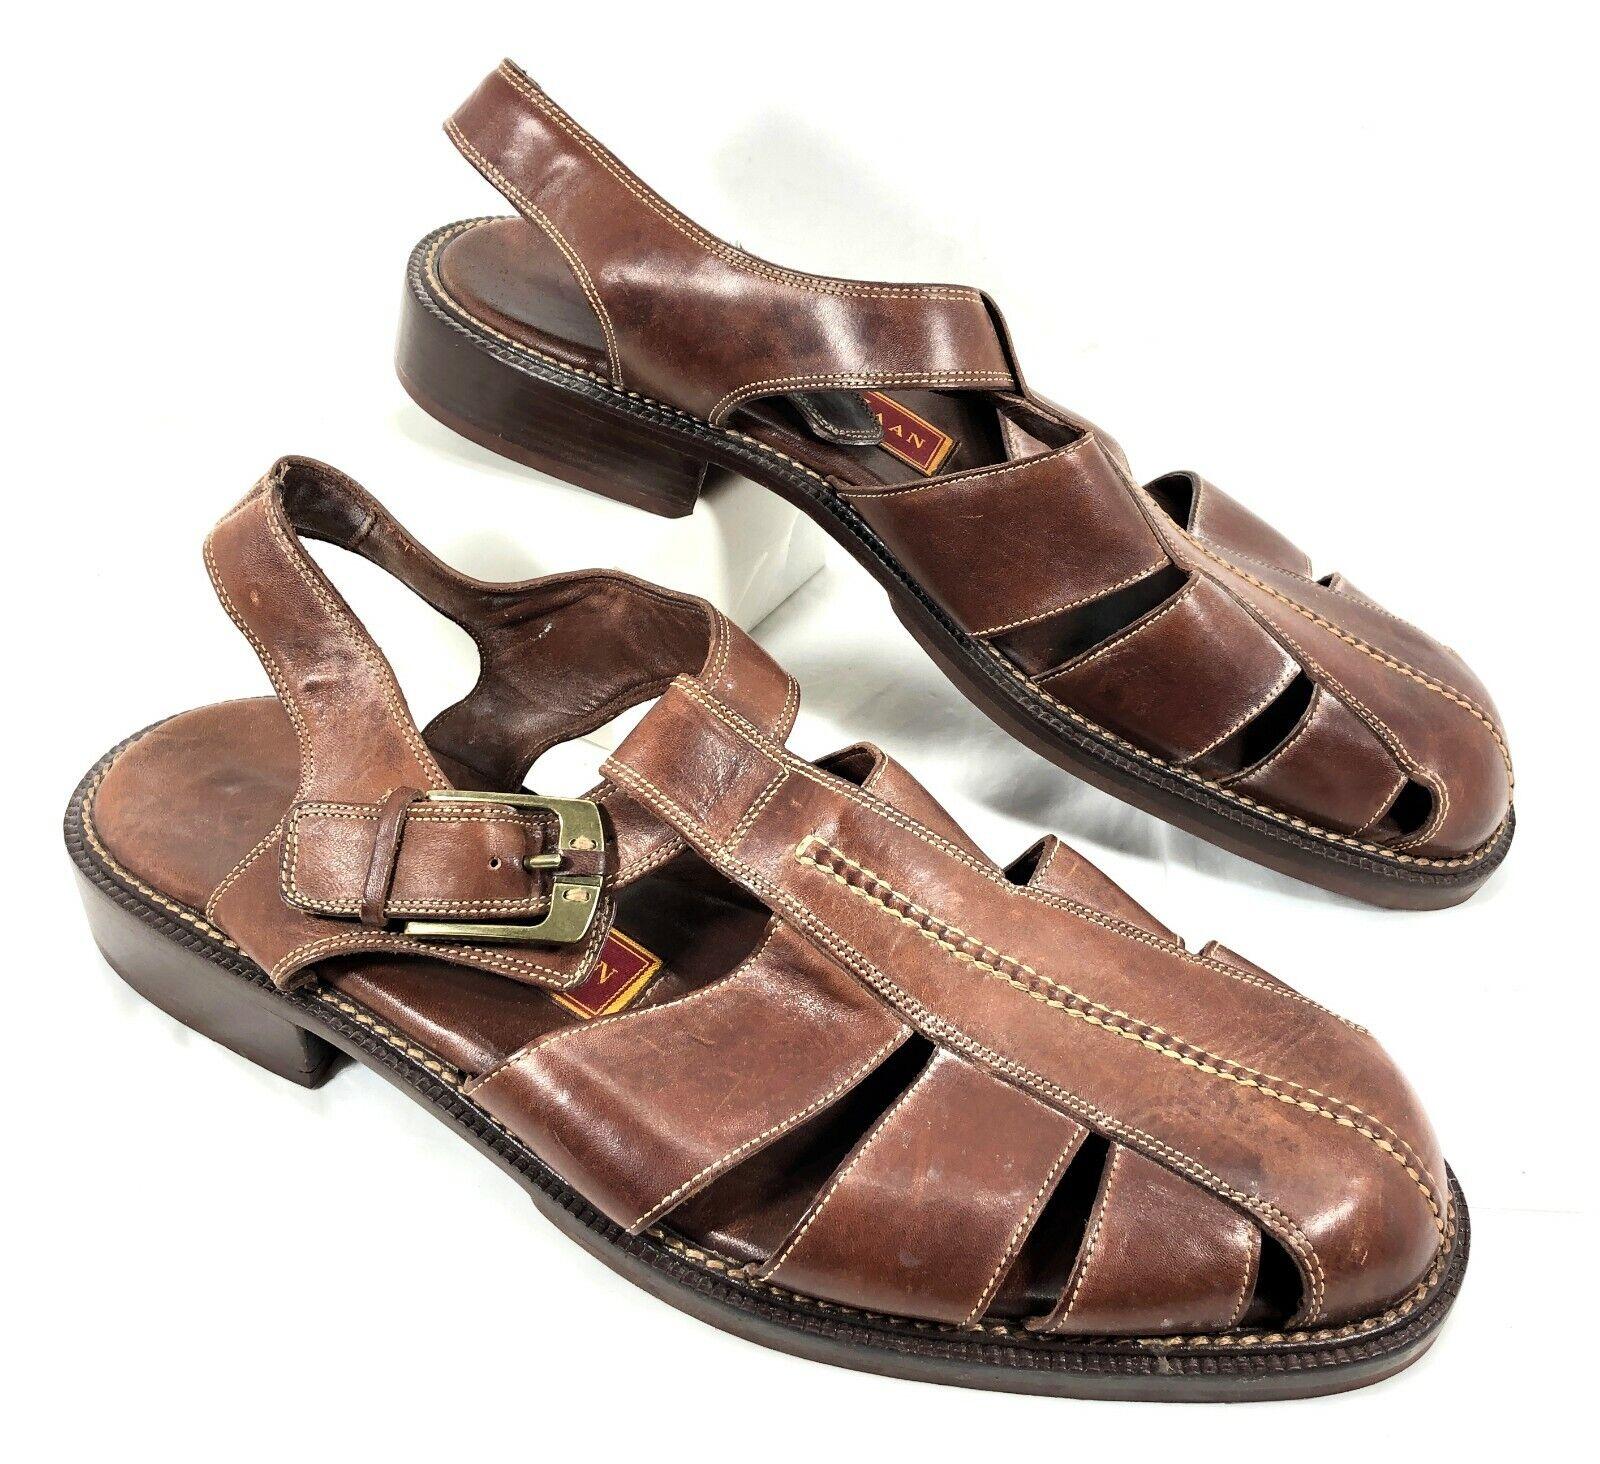 EUC Men's Cole Haan Brown leather Fisherman Sandals Sz 13 M